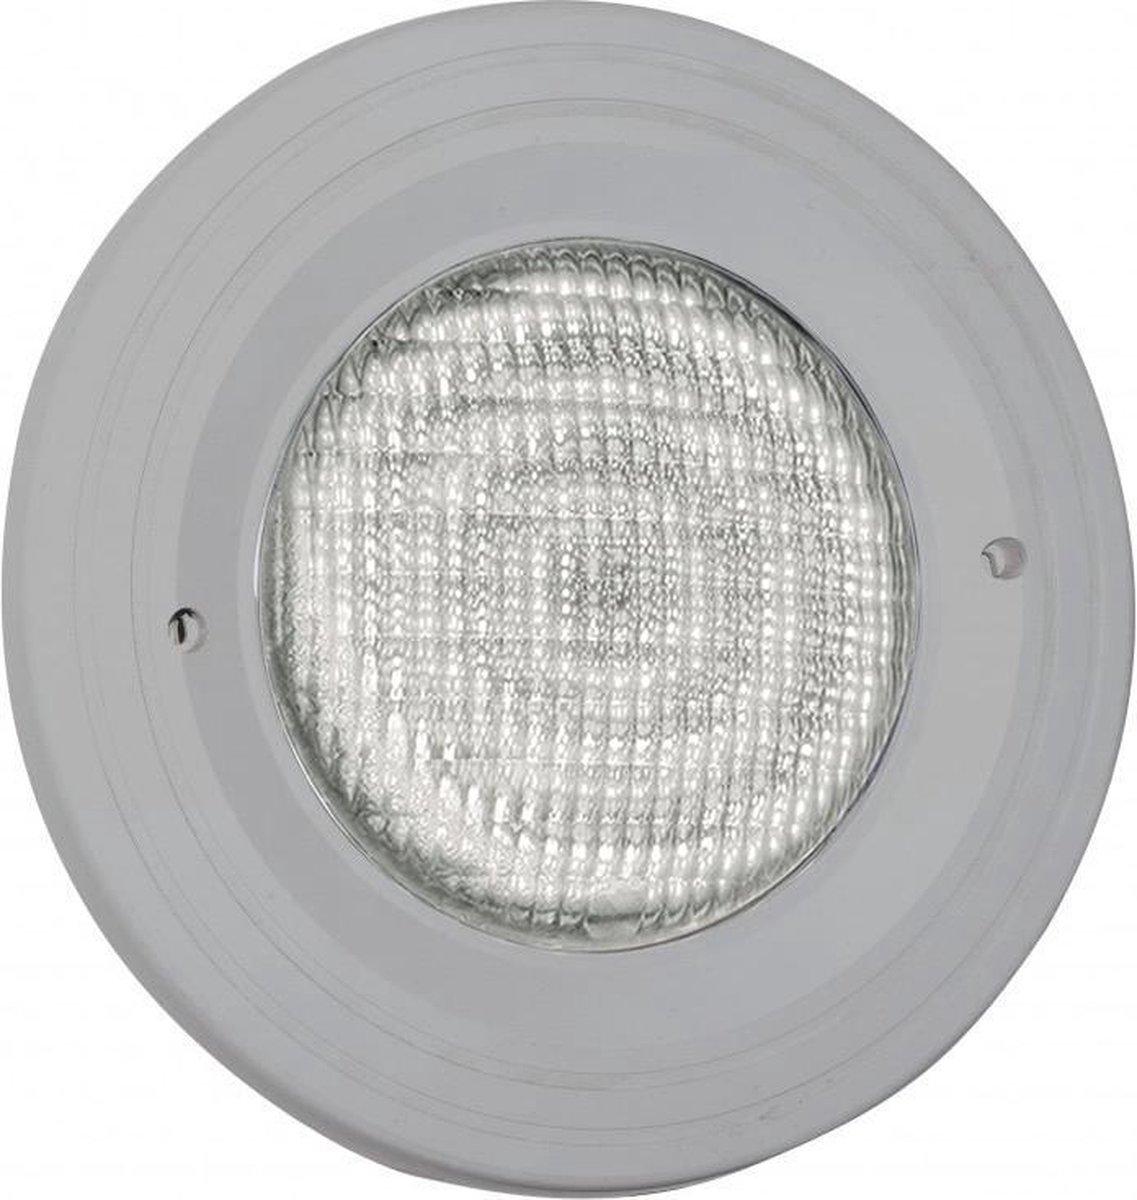 Zwembadlamp LED (wit) + inbouwset Aquareva grijs